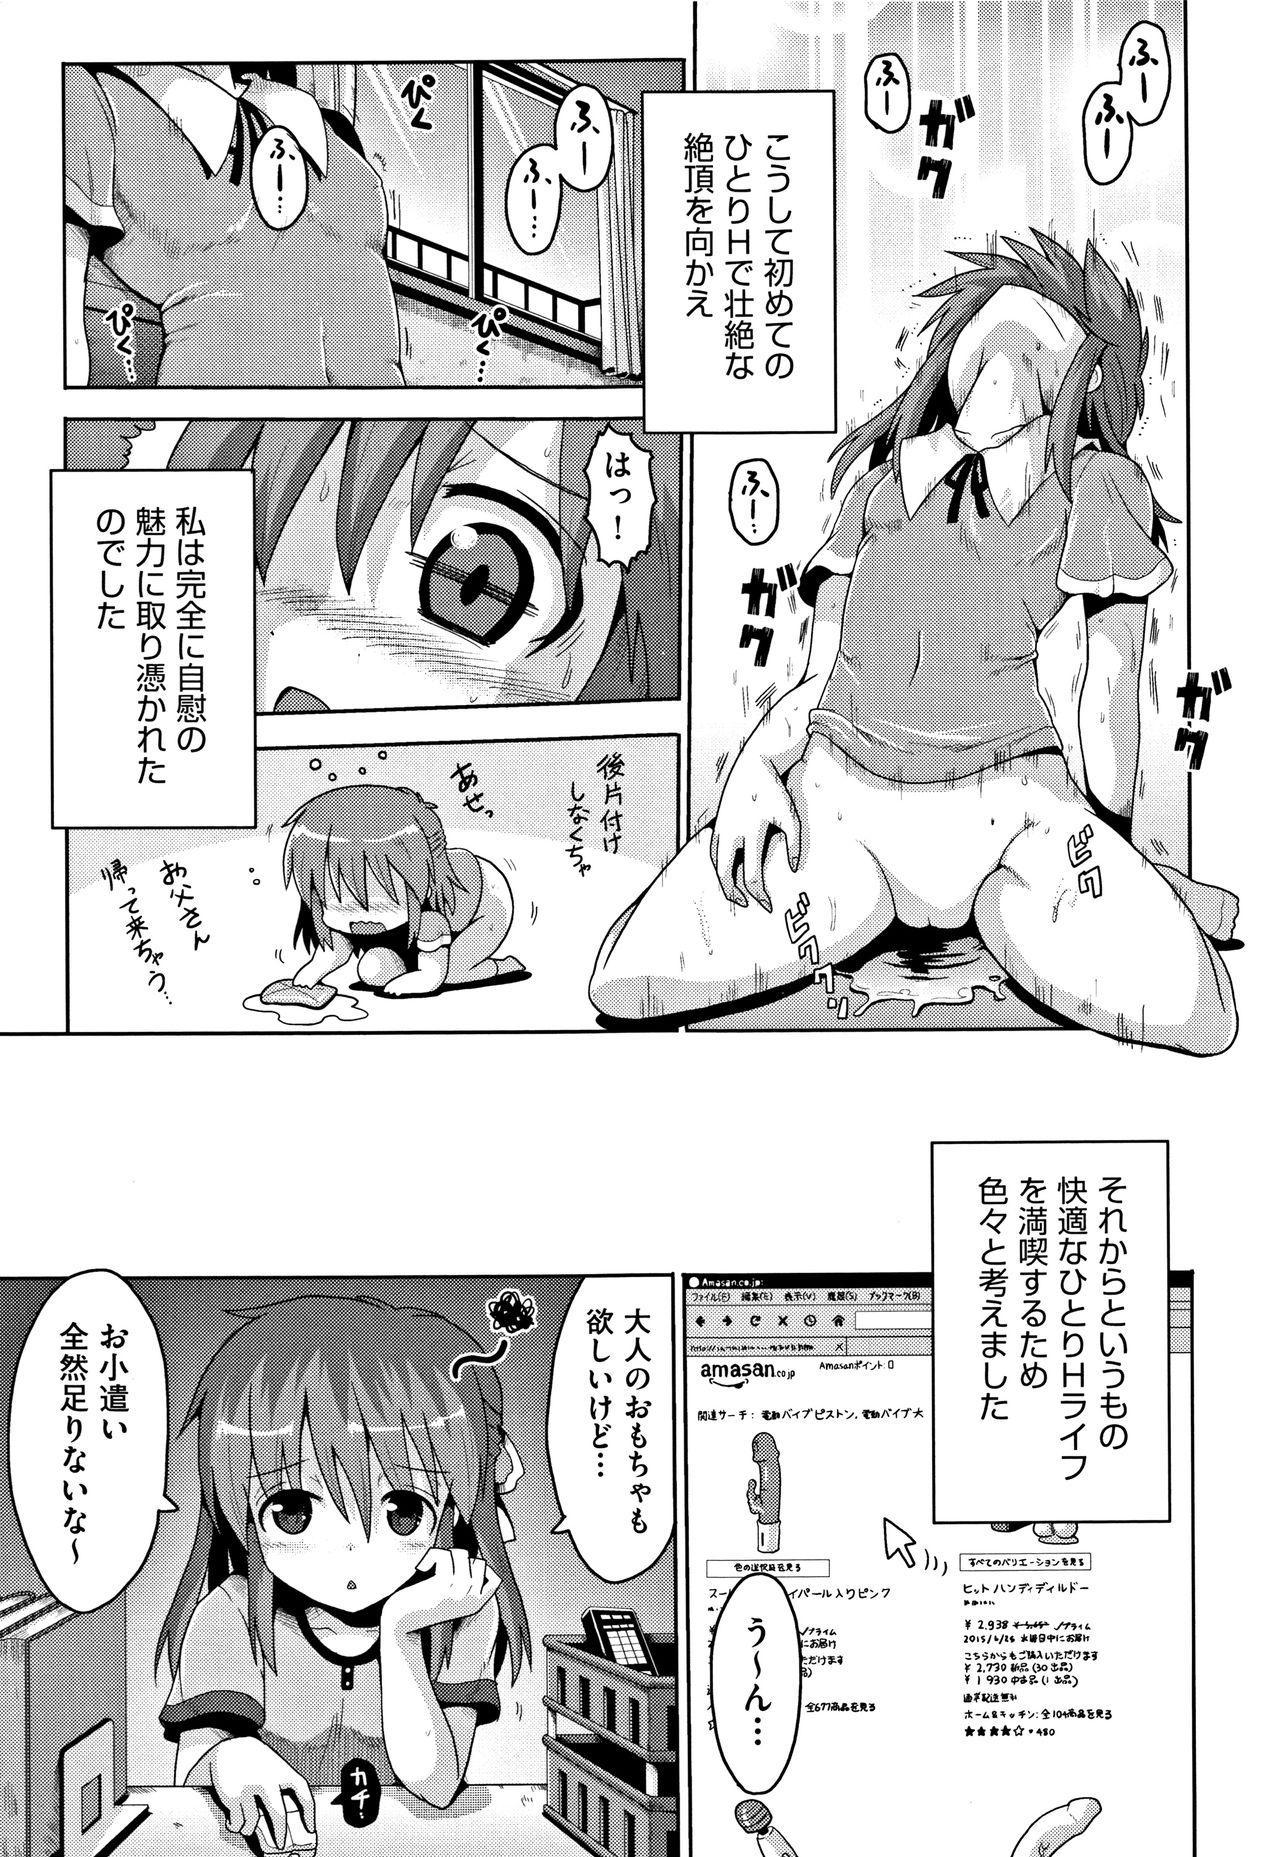 Kokugo Sansuu Rika Sex 125